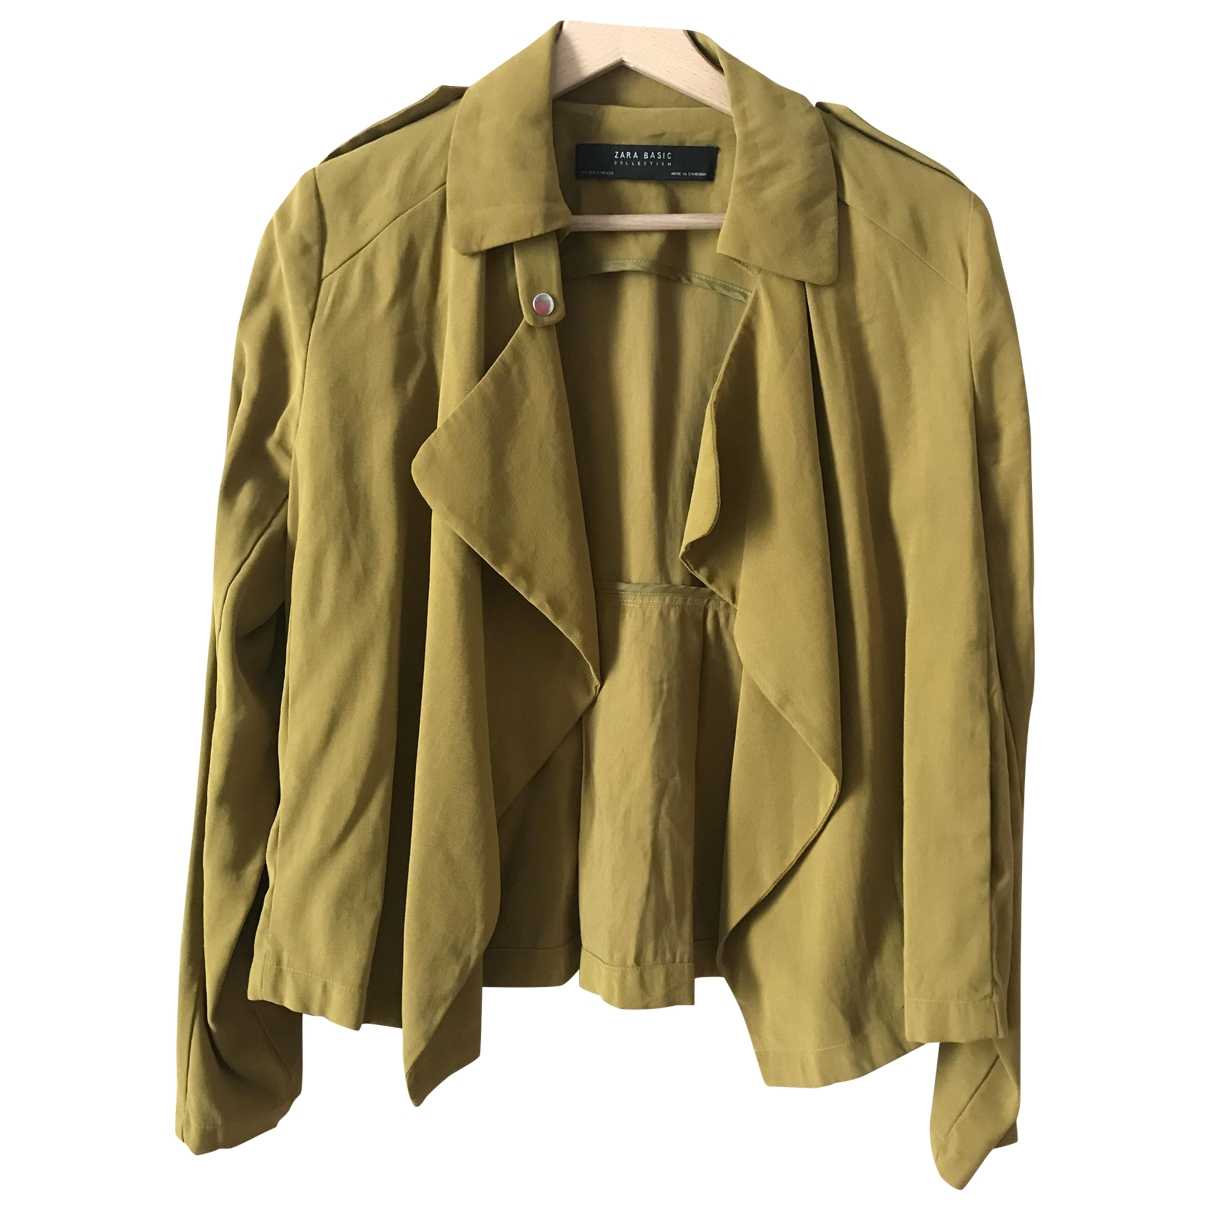 Zara \N Green Cotton jacket for Women S International